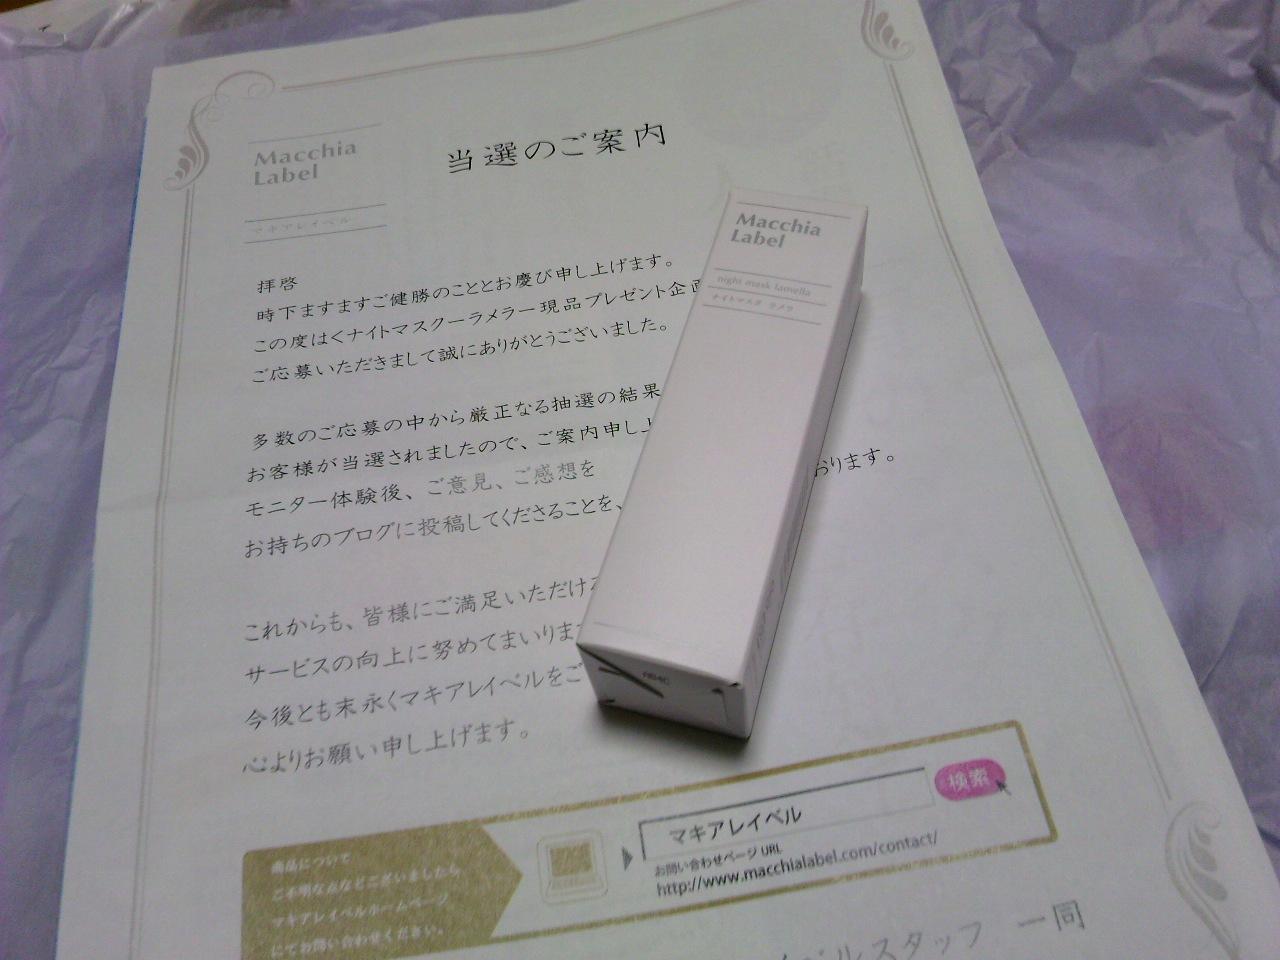 TS3W0331.jpg